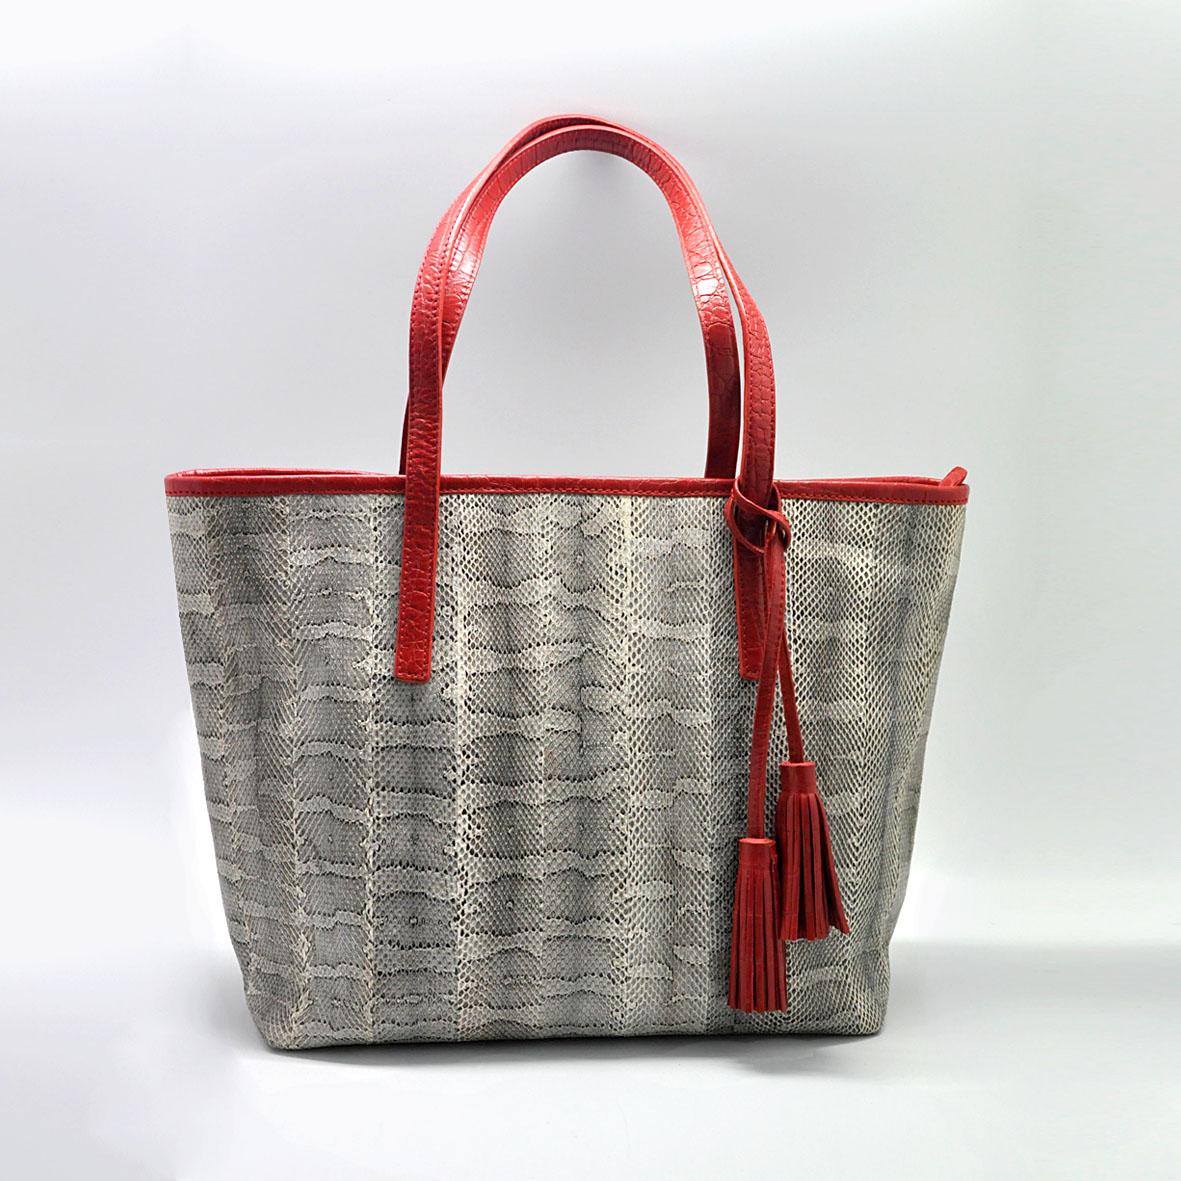 Tote Bag - Buccata Skin